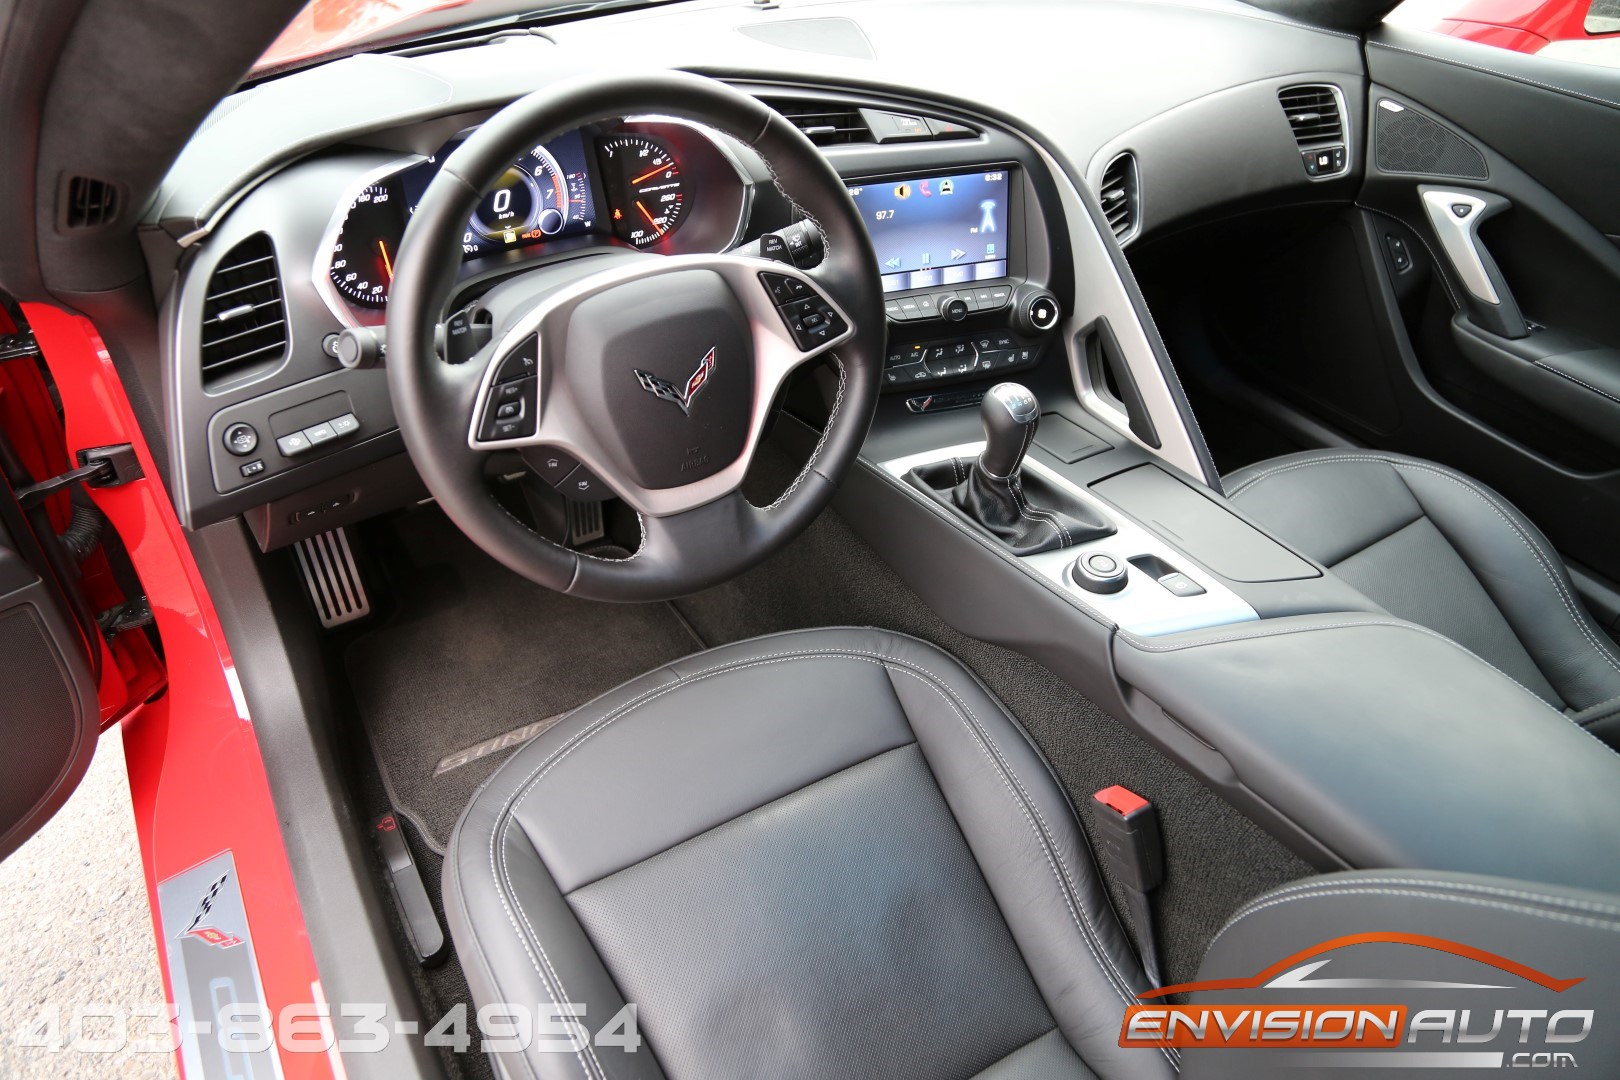 2015 chevrolet corvette stingray 3lt zf1 only 7 100kms gmpp warranty